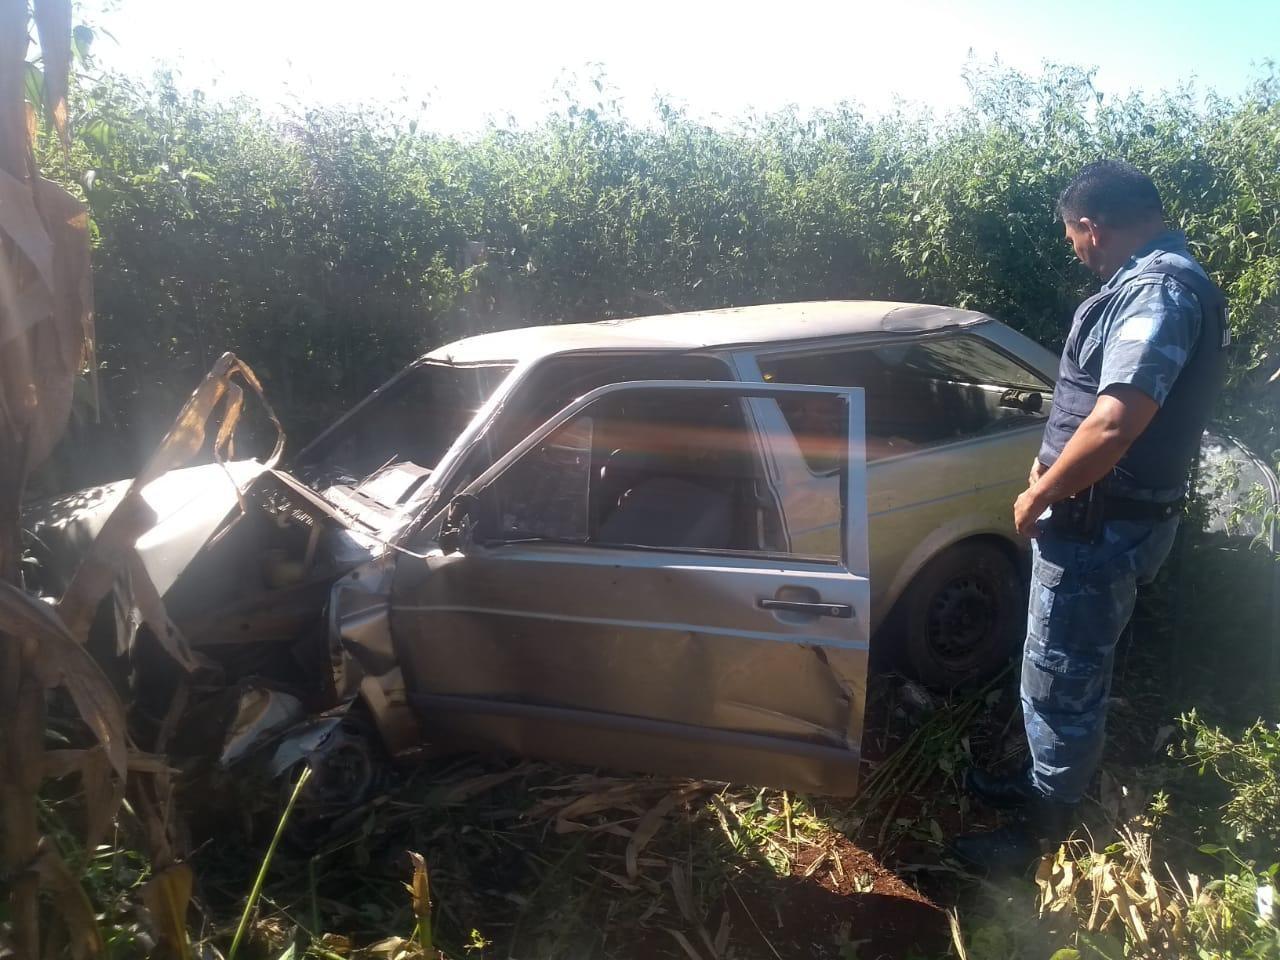 Motorista fica ferido após acidente em vicinal de Botucatu - Noticias